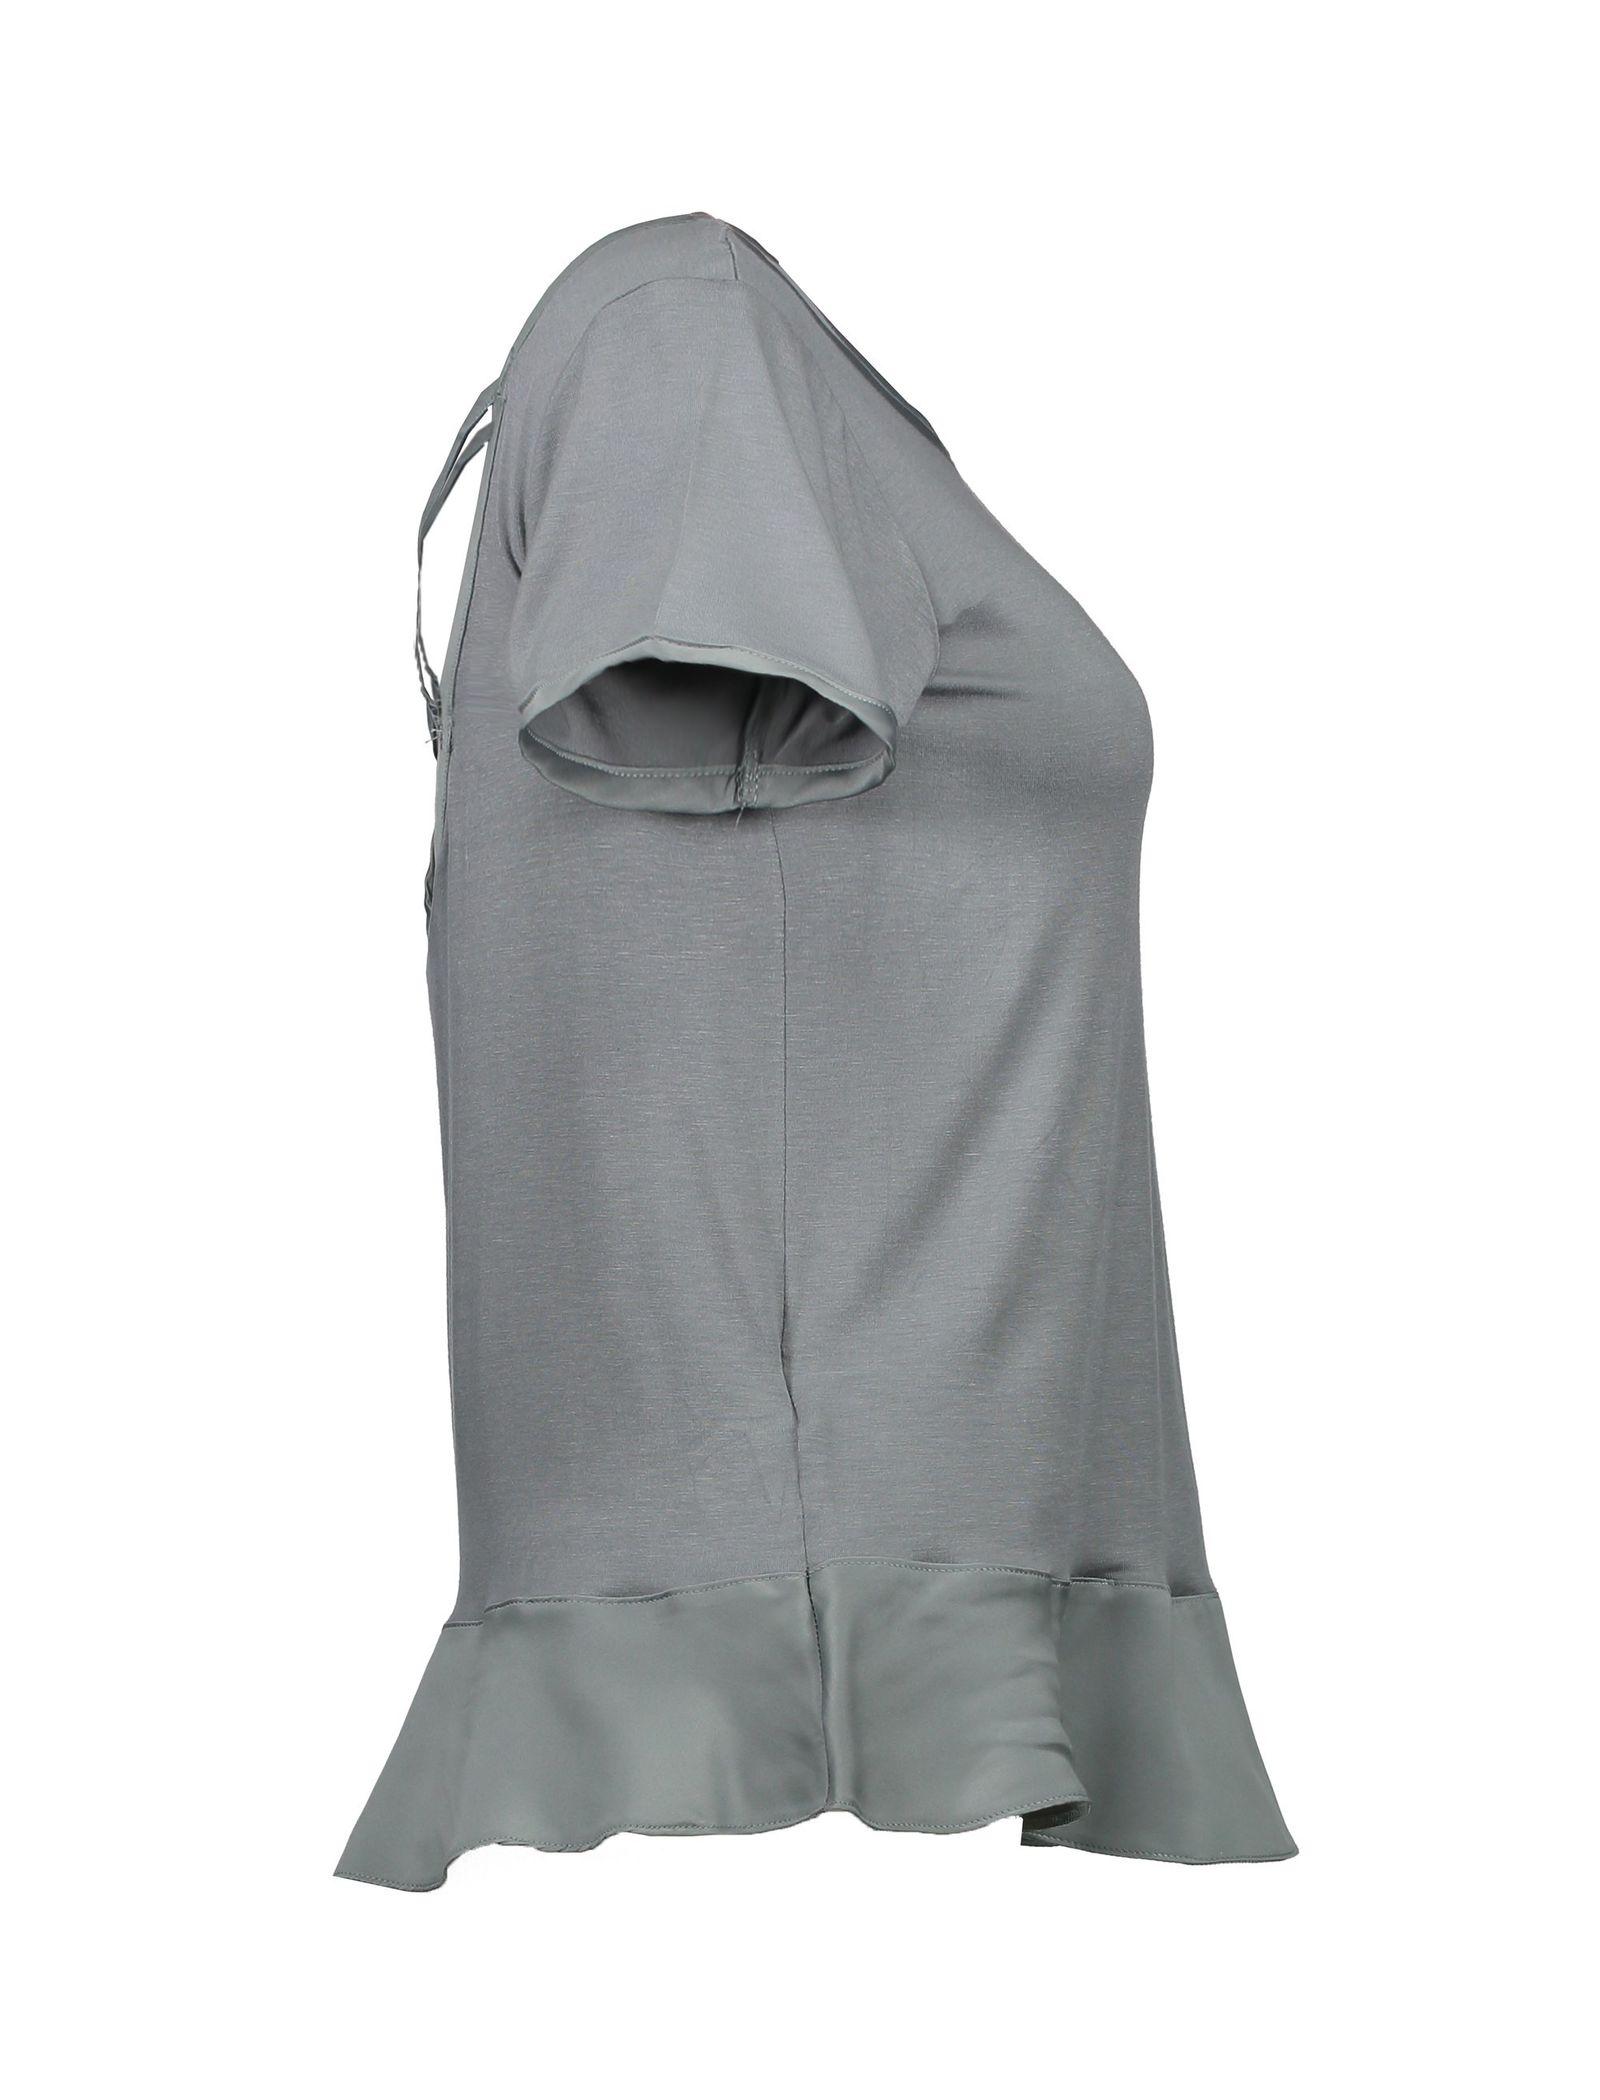 تی شرت و شلوار راحتی ویسکوز زنانه - کالکشن - طوسي   - 8